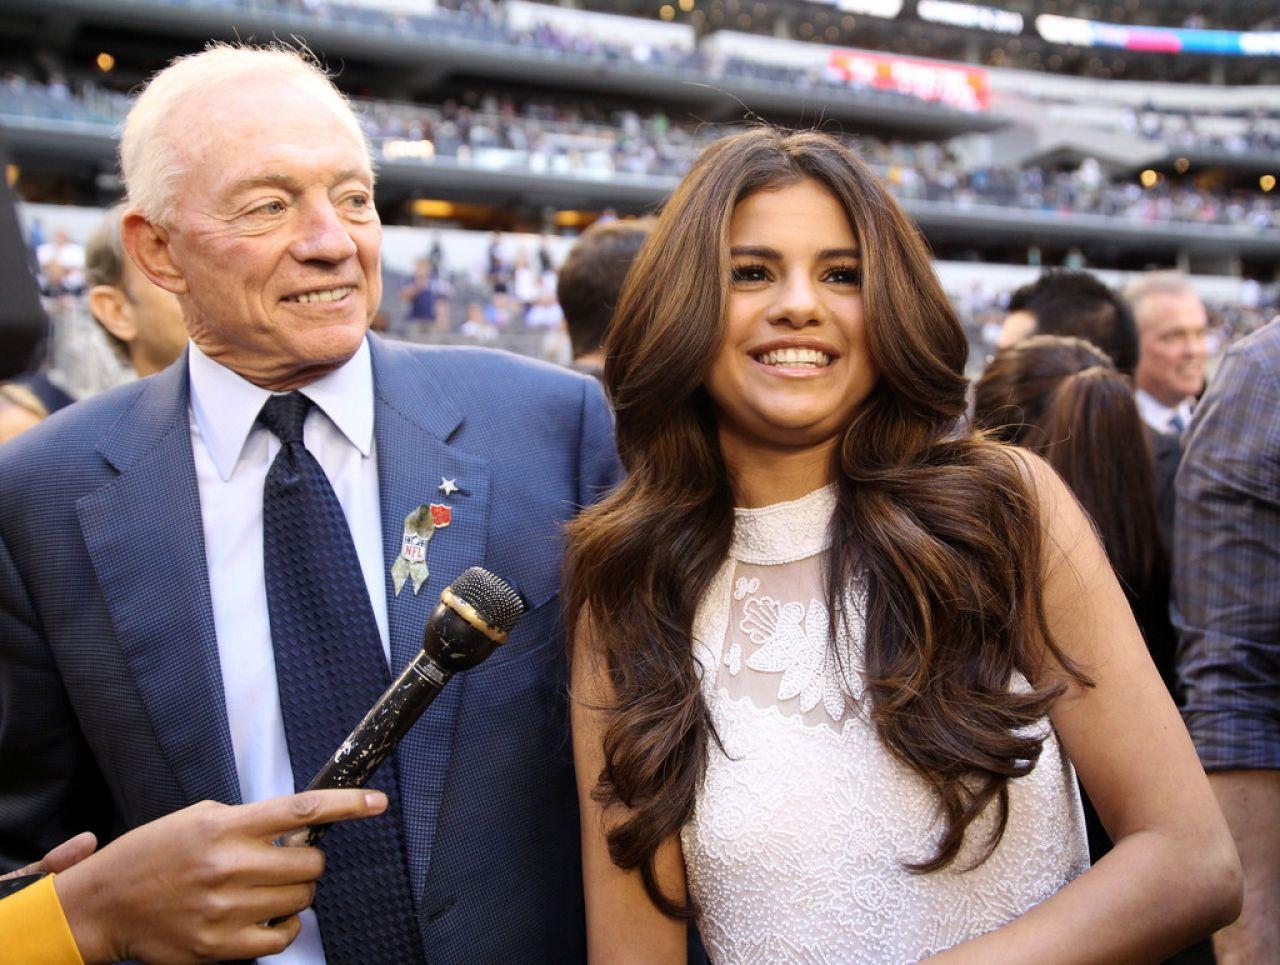 Selena Gomez - Vikings vs Cowboys at Cowboys Stadium in Arlington